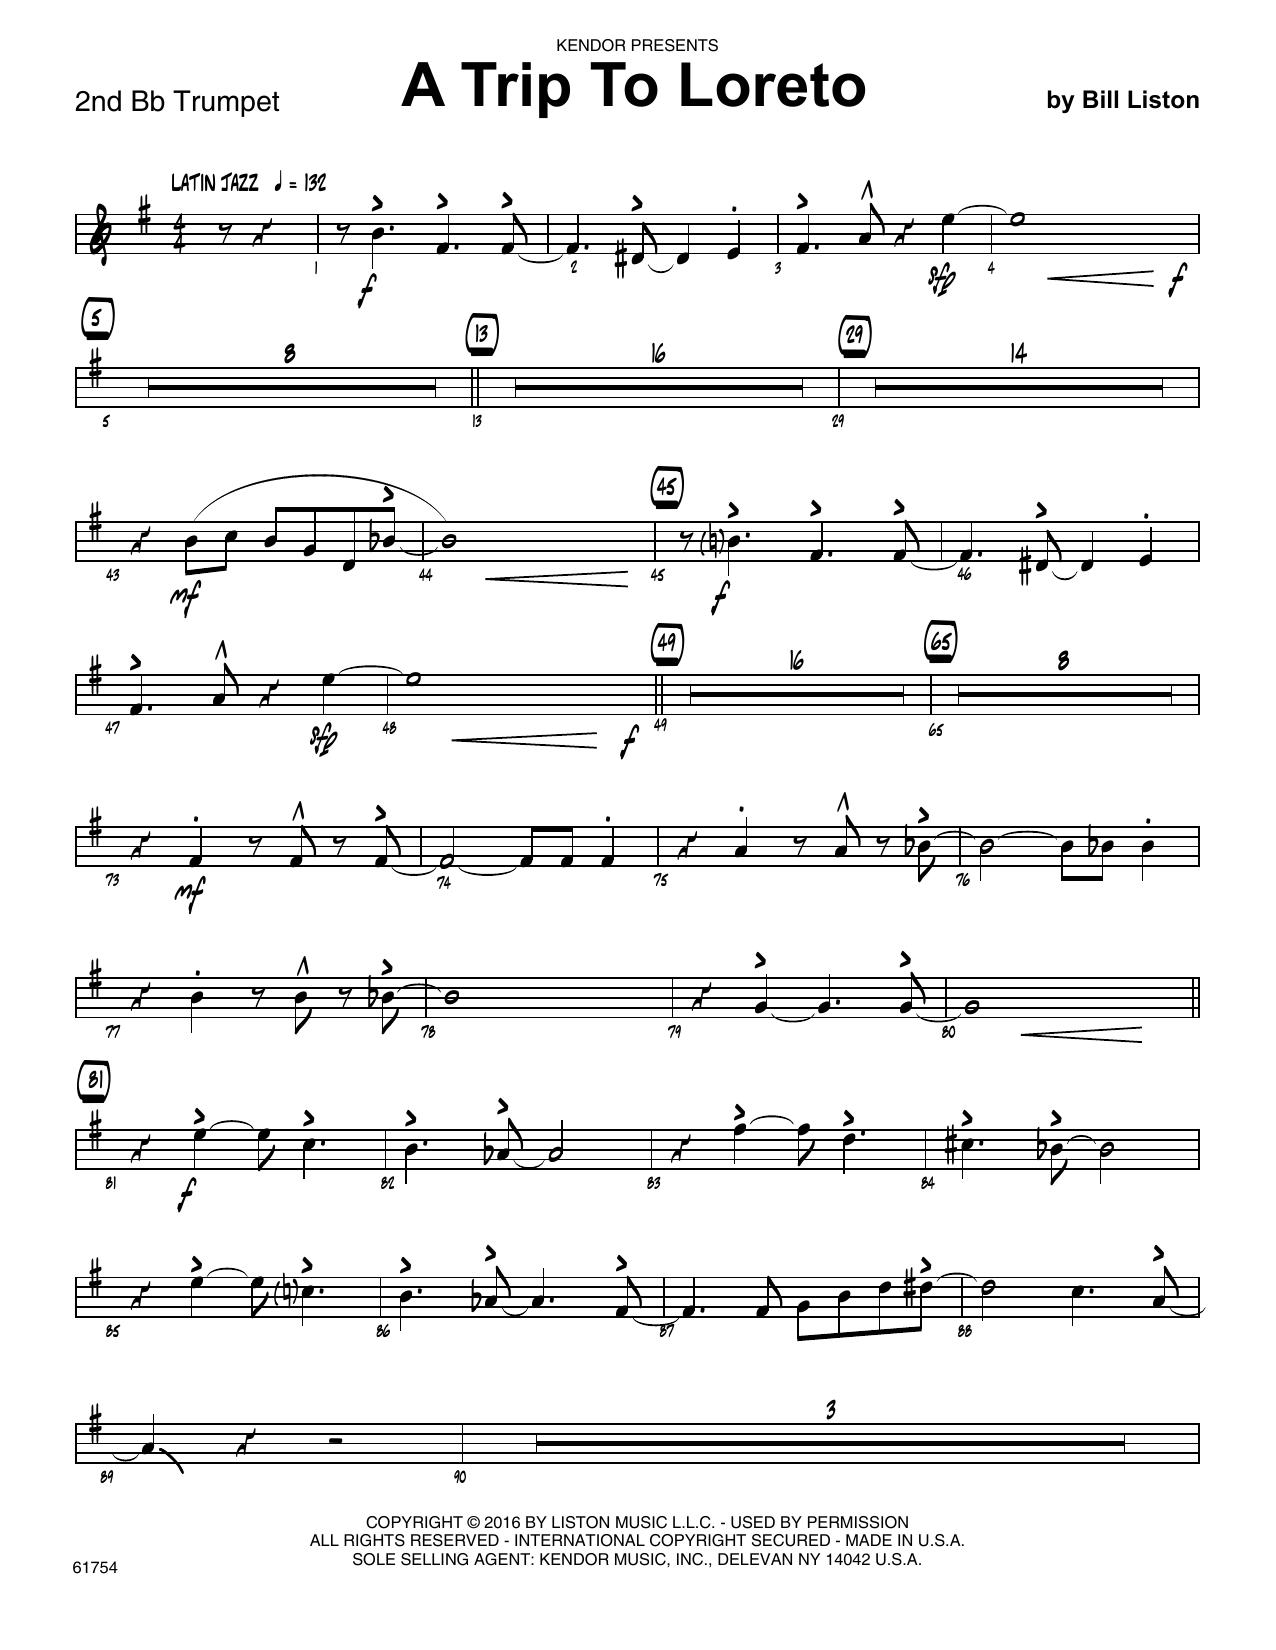 A Trip To Loreto - 2nd Bb Trumpet Sheet Music